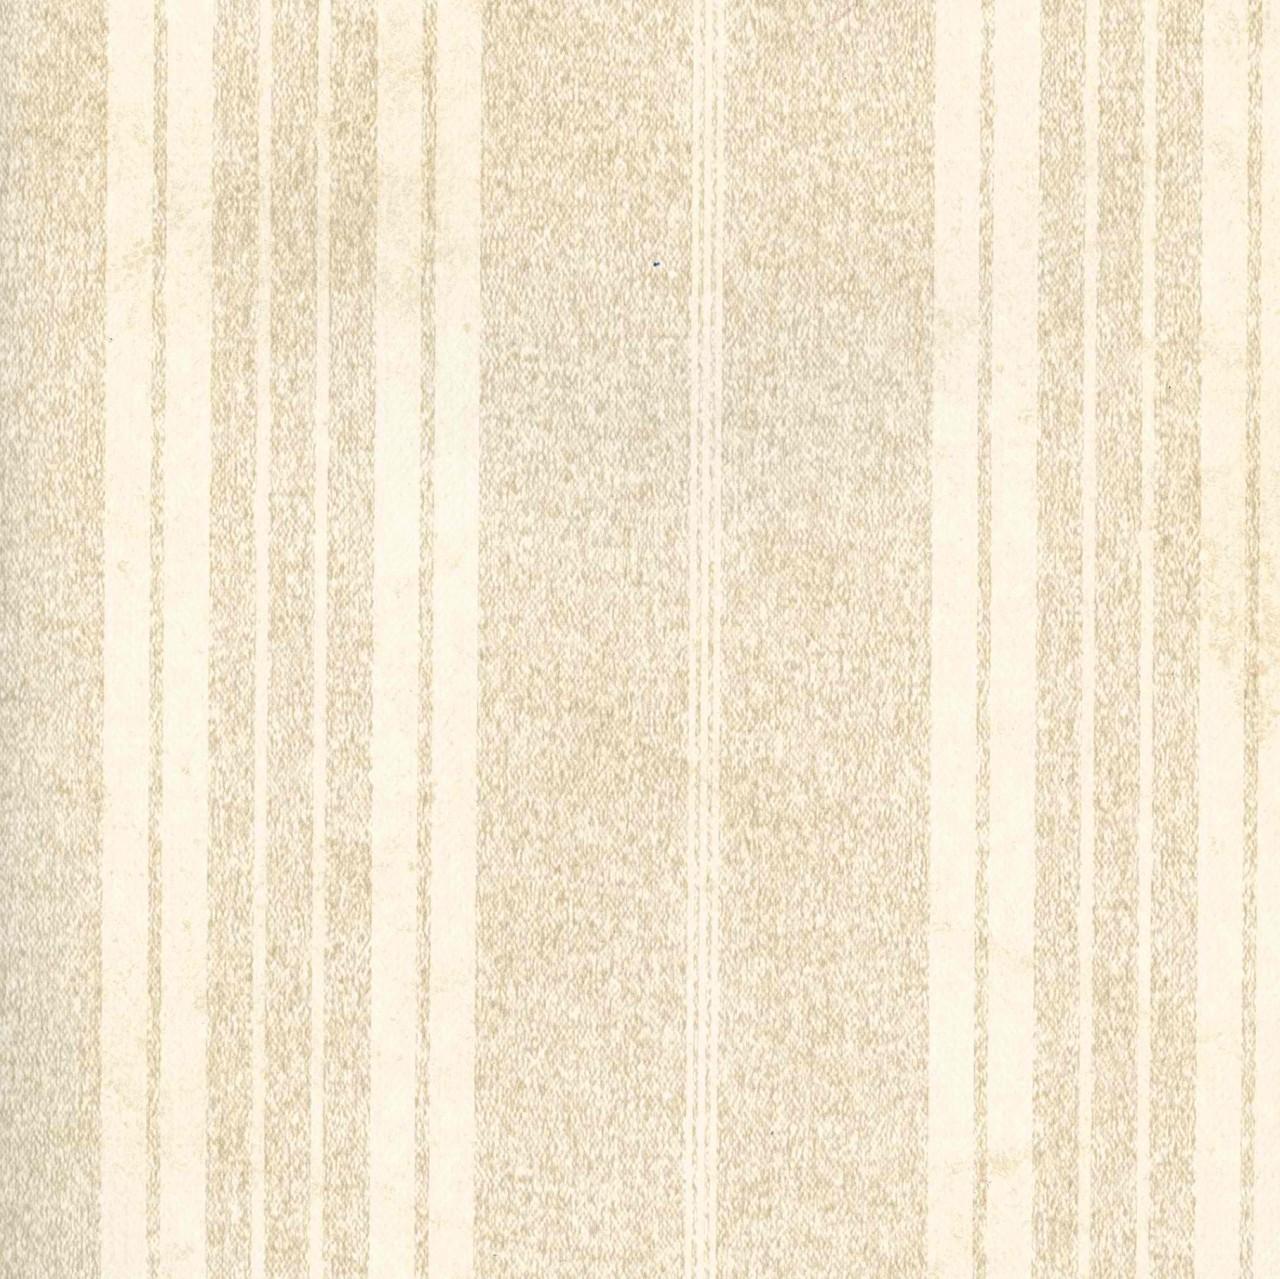 Cream Beige CG66312 Farmhouse Stripe Wallpaper   Kitchen Bathroom 1280x1279